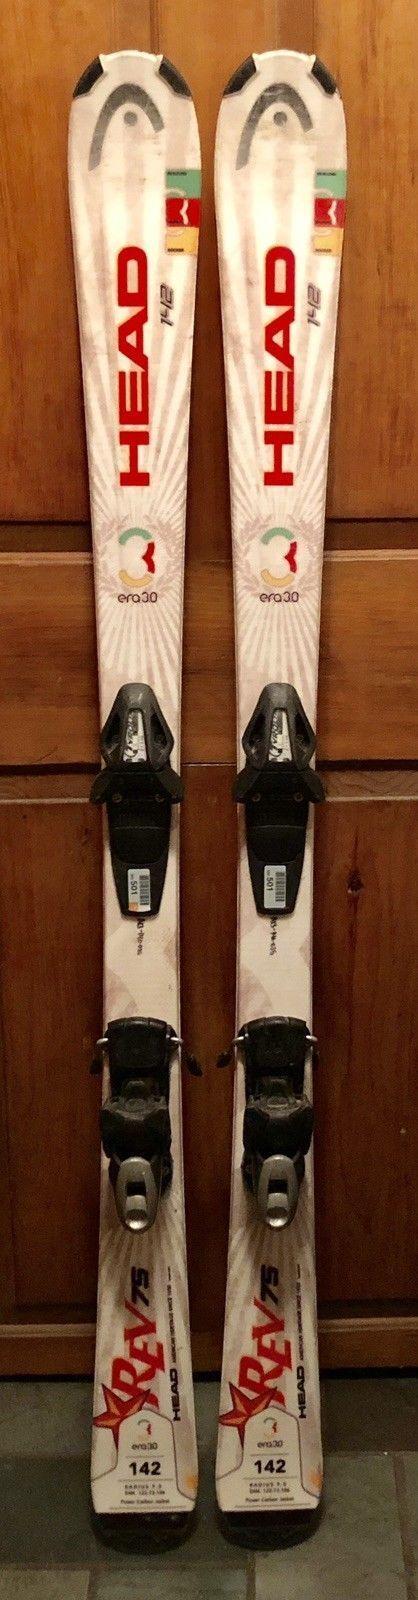 142 cm Head Rev 75 skis bindings  + womens 7.5 boots + optional helmet Leki poles  hot limited edition